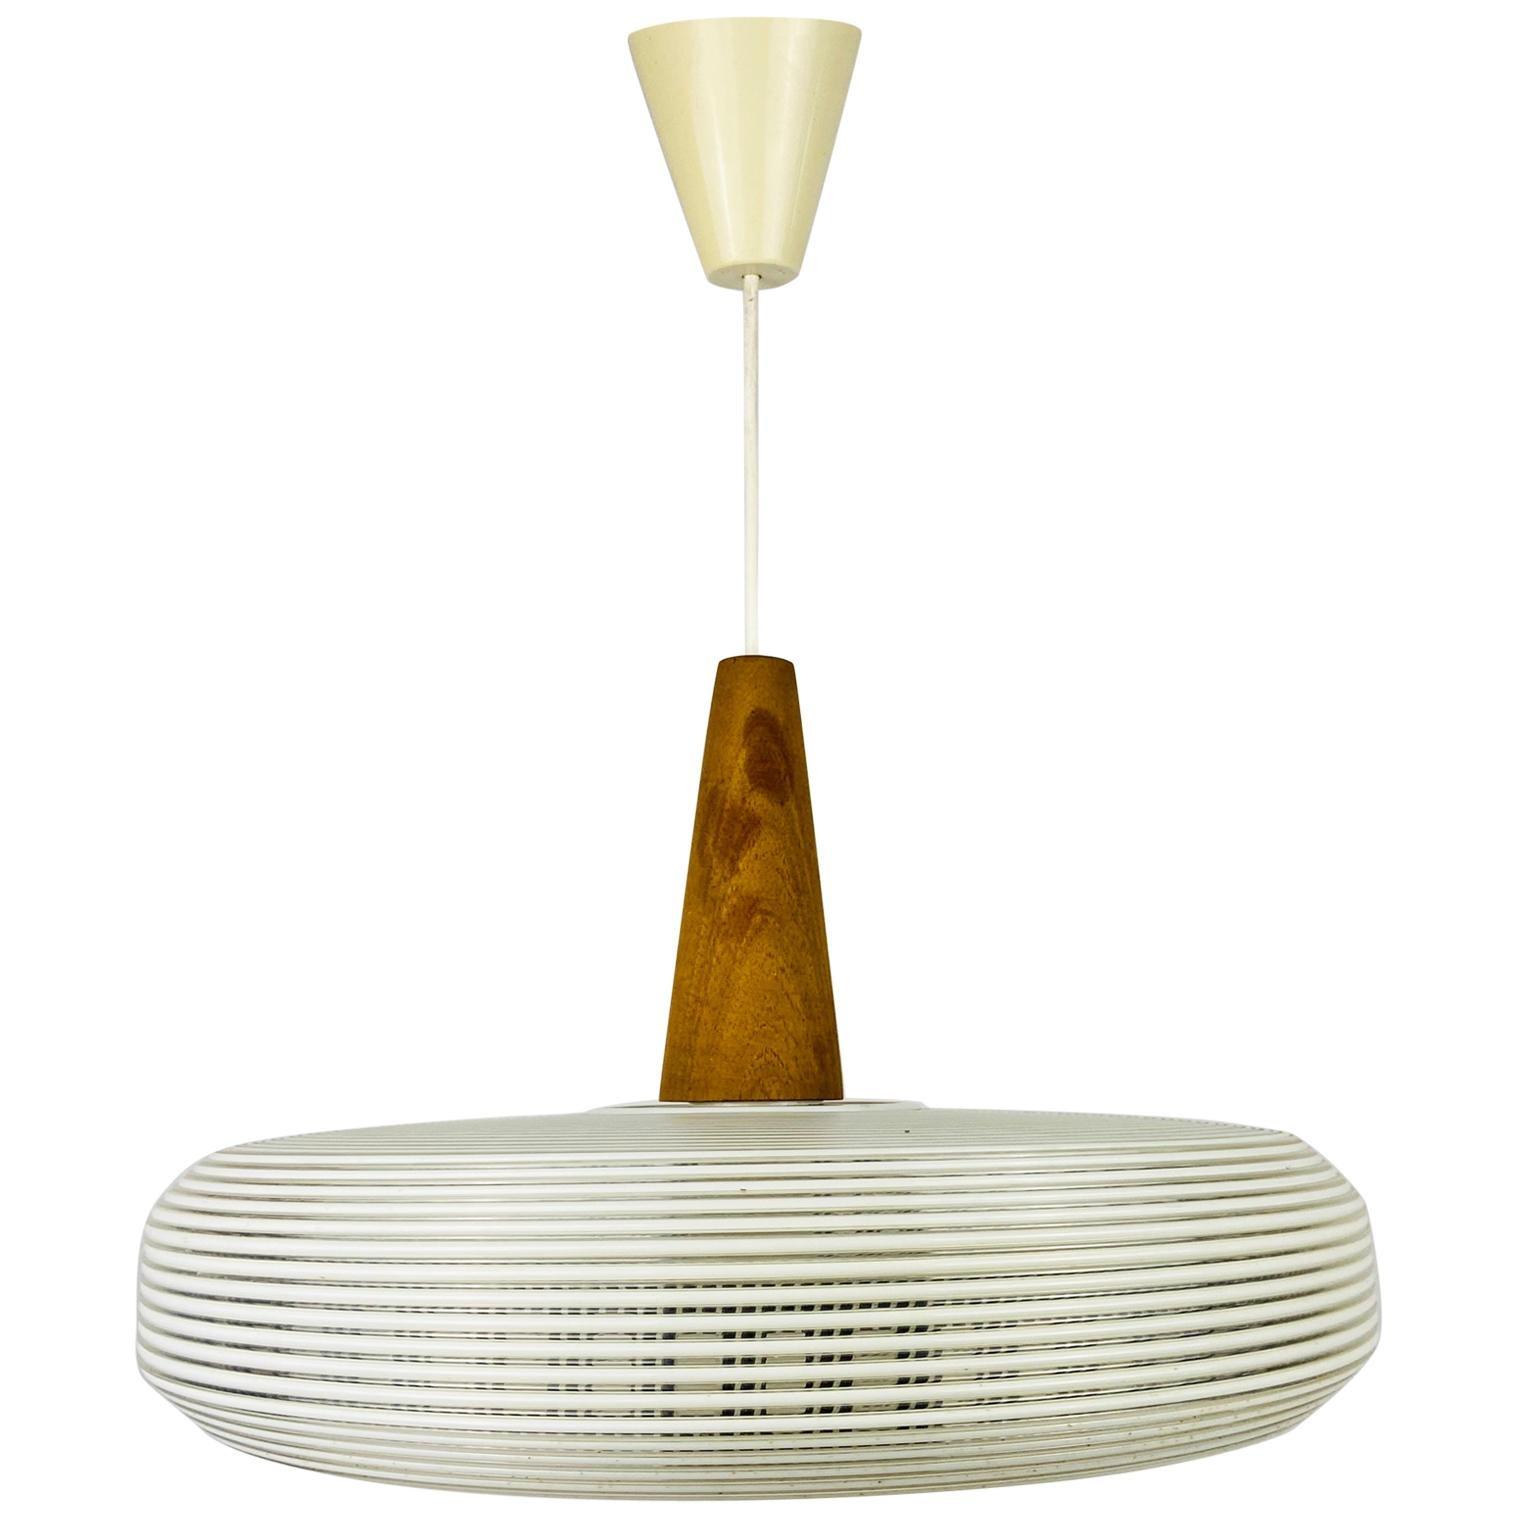 Midcentury Rotaflex Pendant Lamp, 1960s